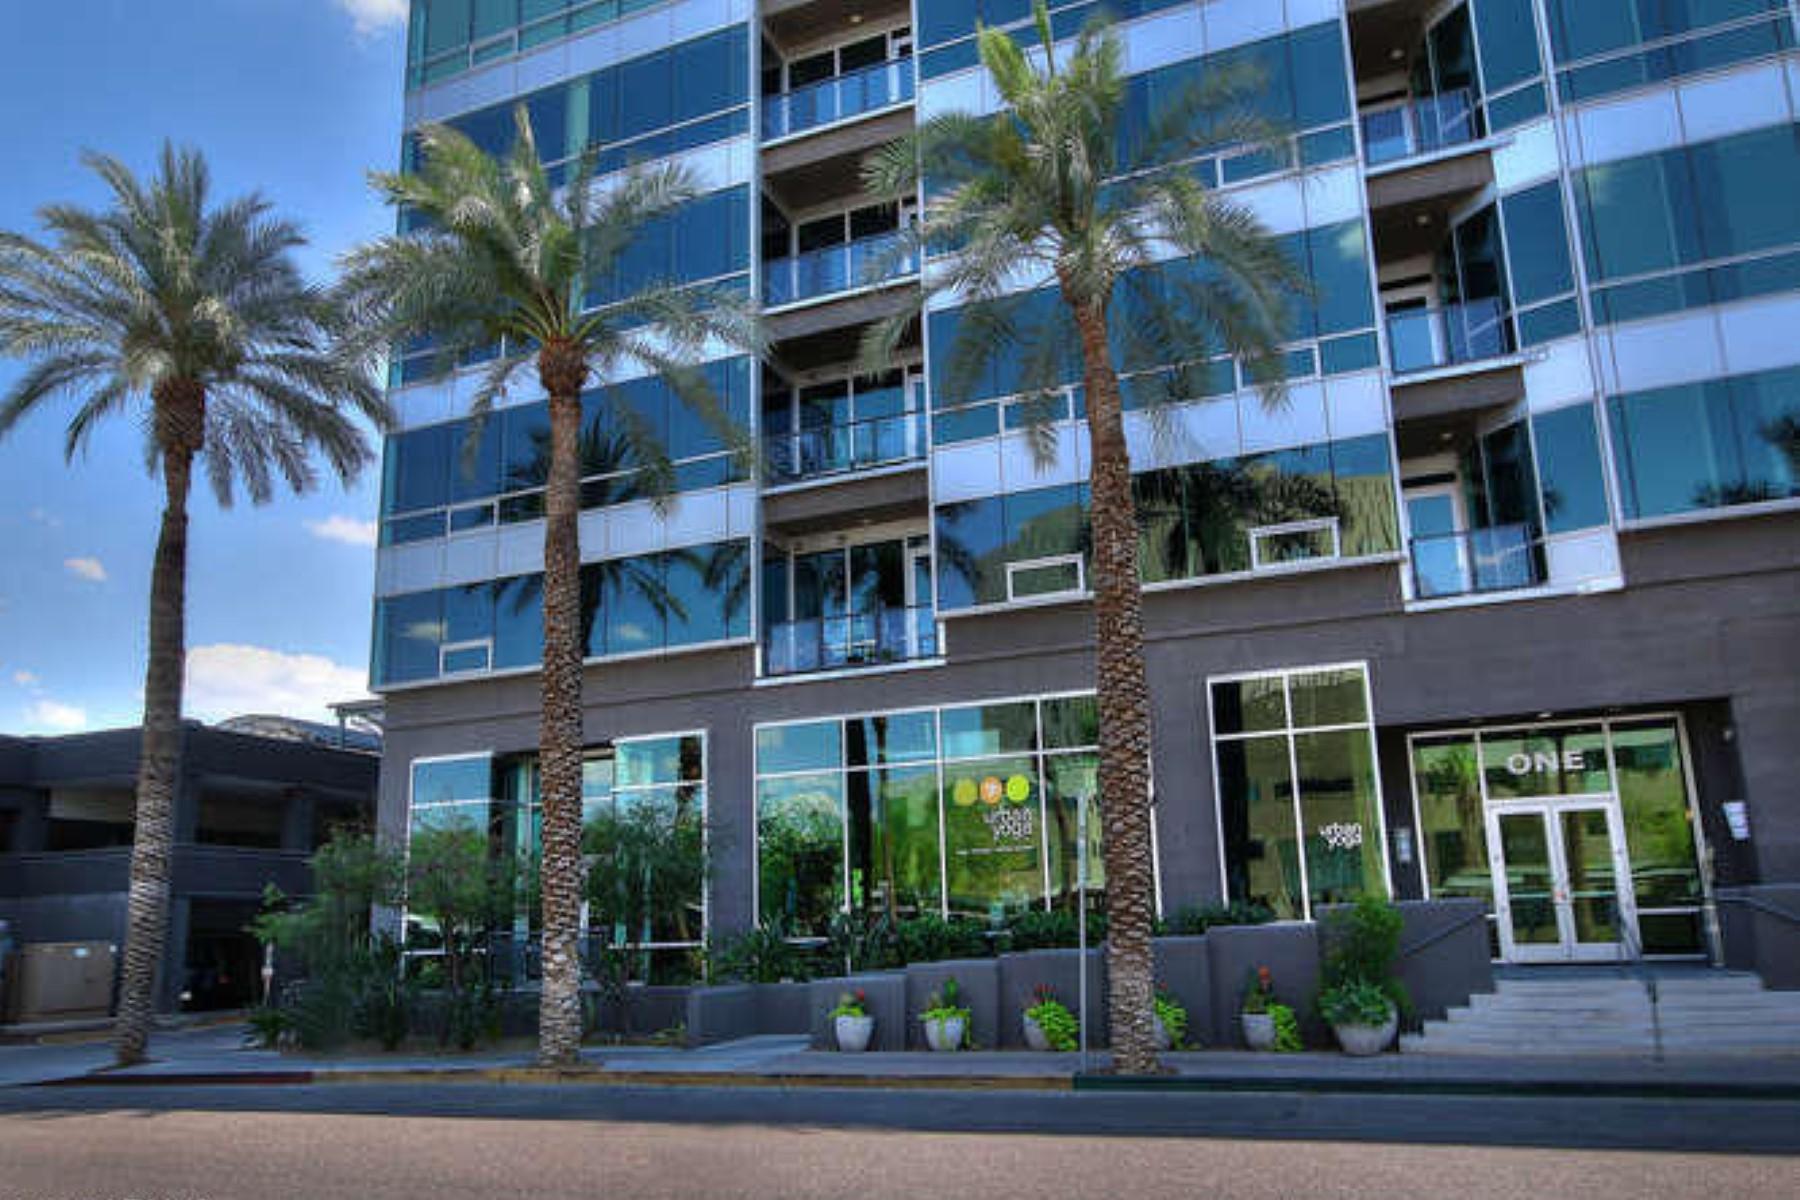 Single Family Home for Sale at Gorgeous northern exposure contemporary loft 1 E LEXINGTON AVE #1307 Phoenix, Arizona, 85012 United States